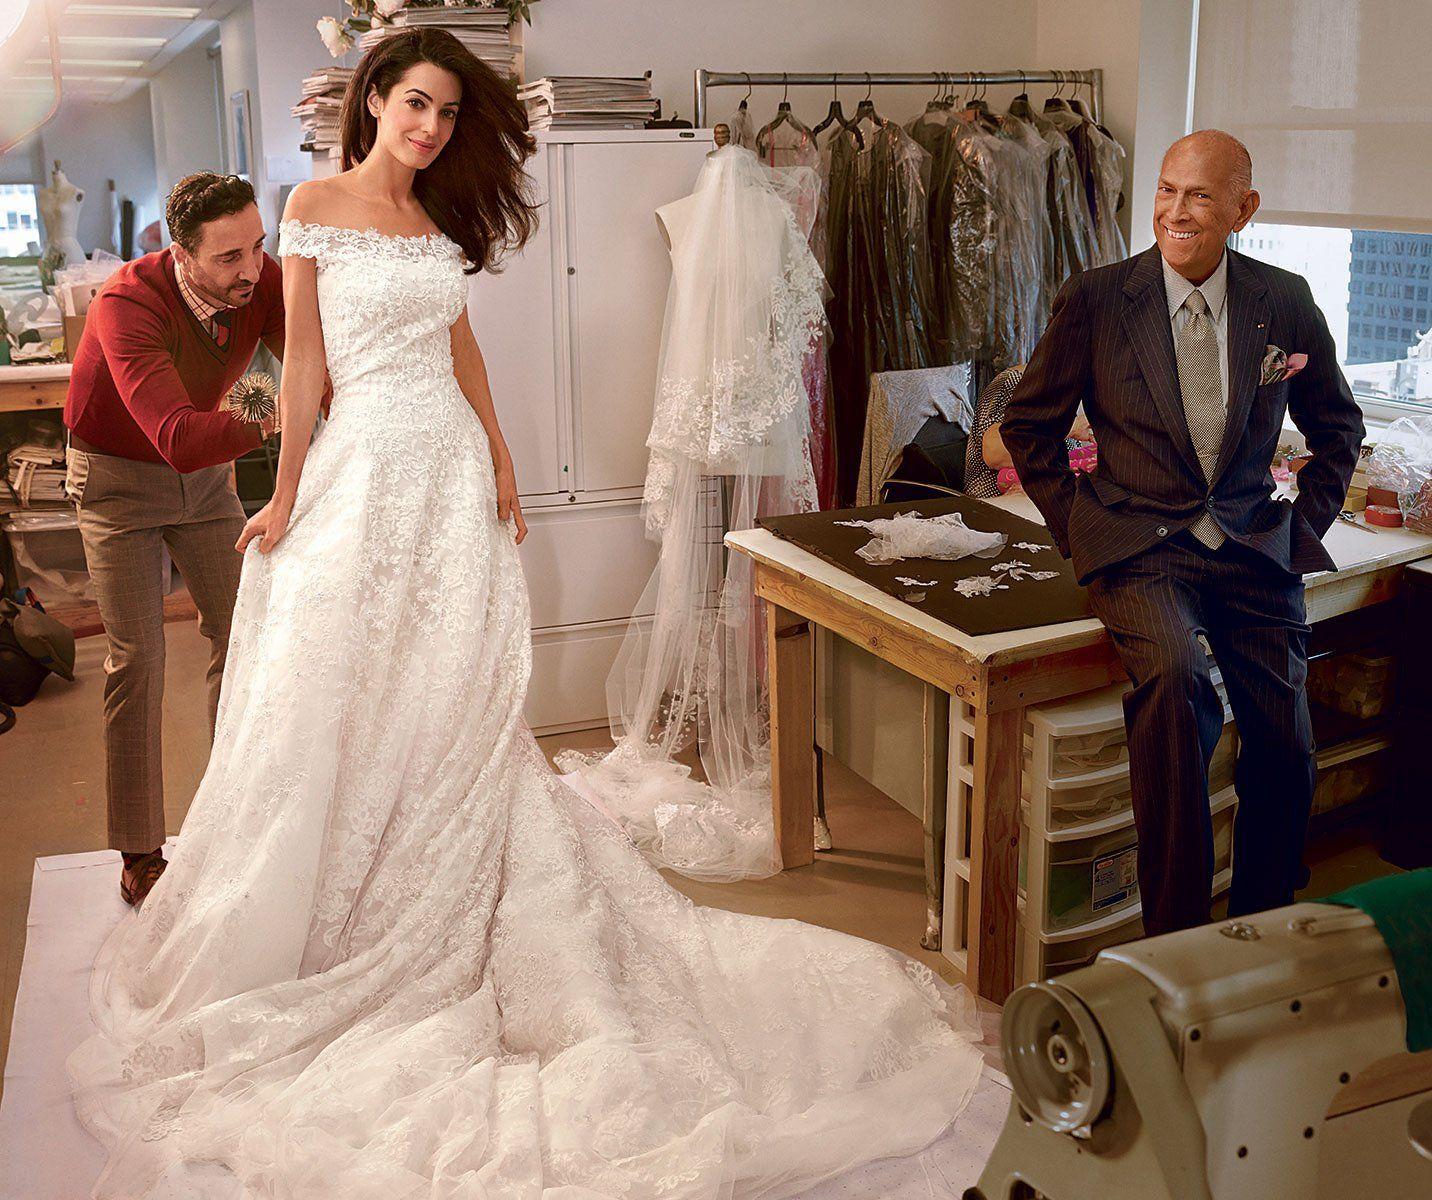 wedding dresses photos wedding style celebrating. Black Bedroom Furniture Sets. Home Design Ideas